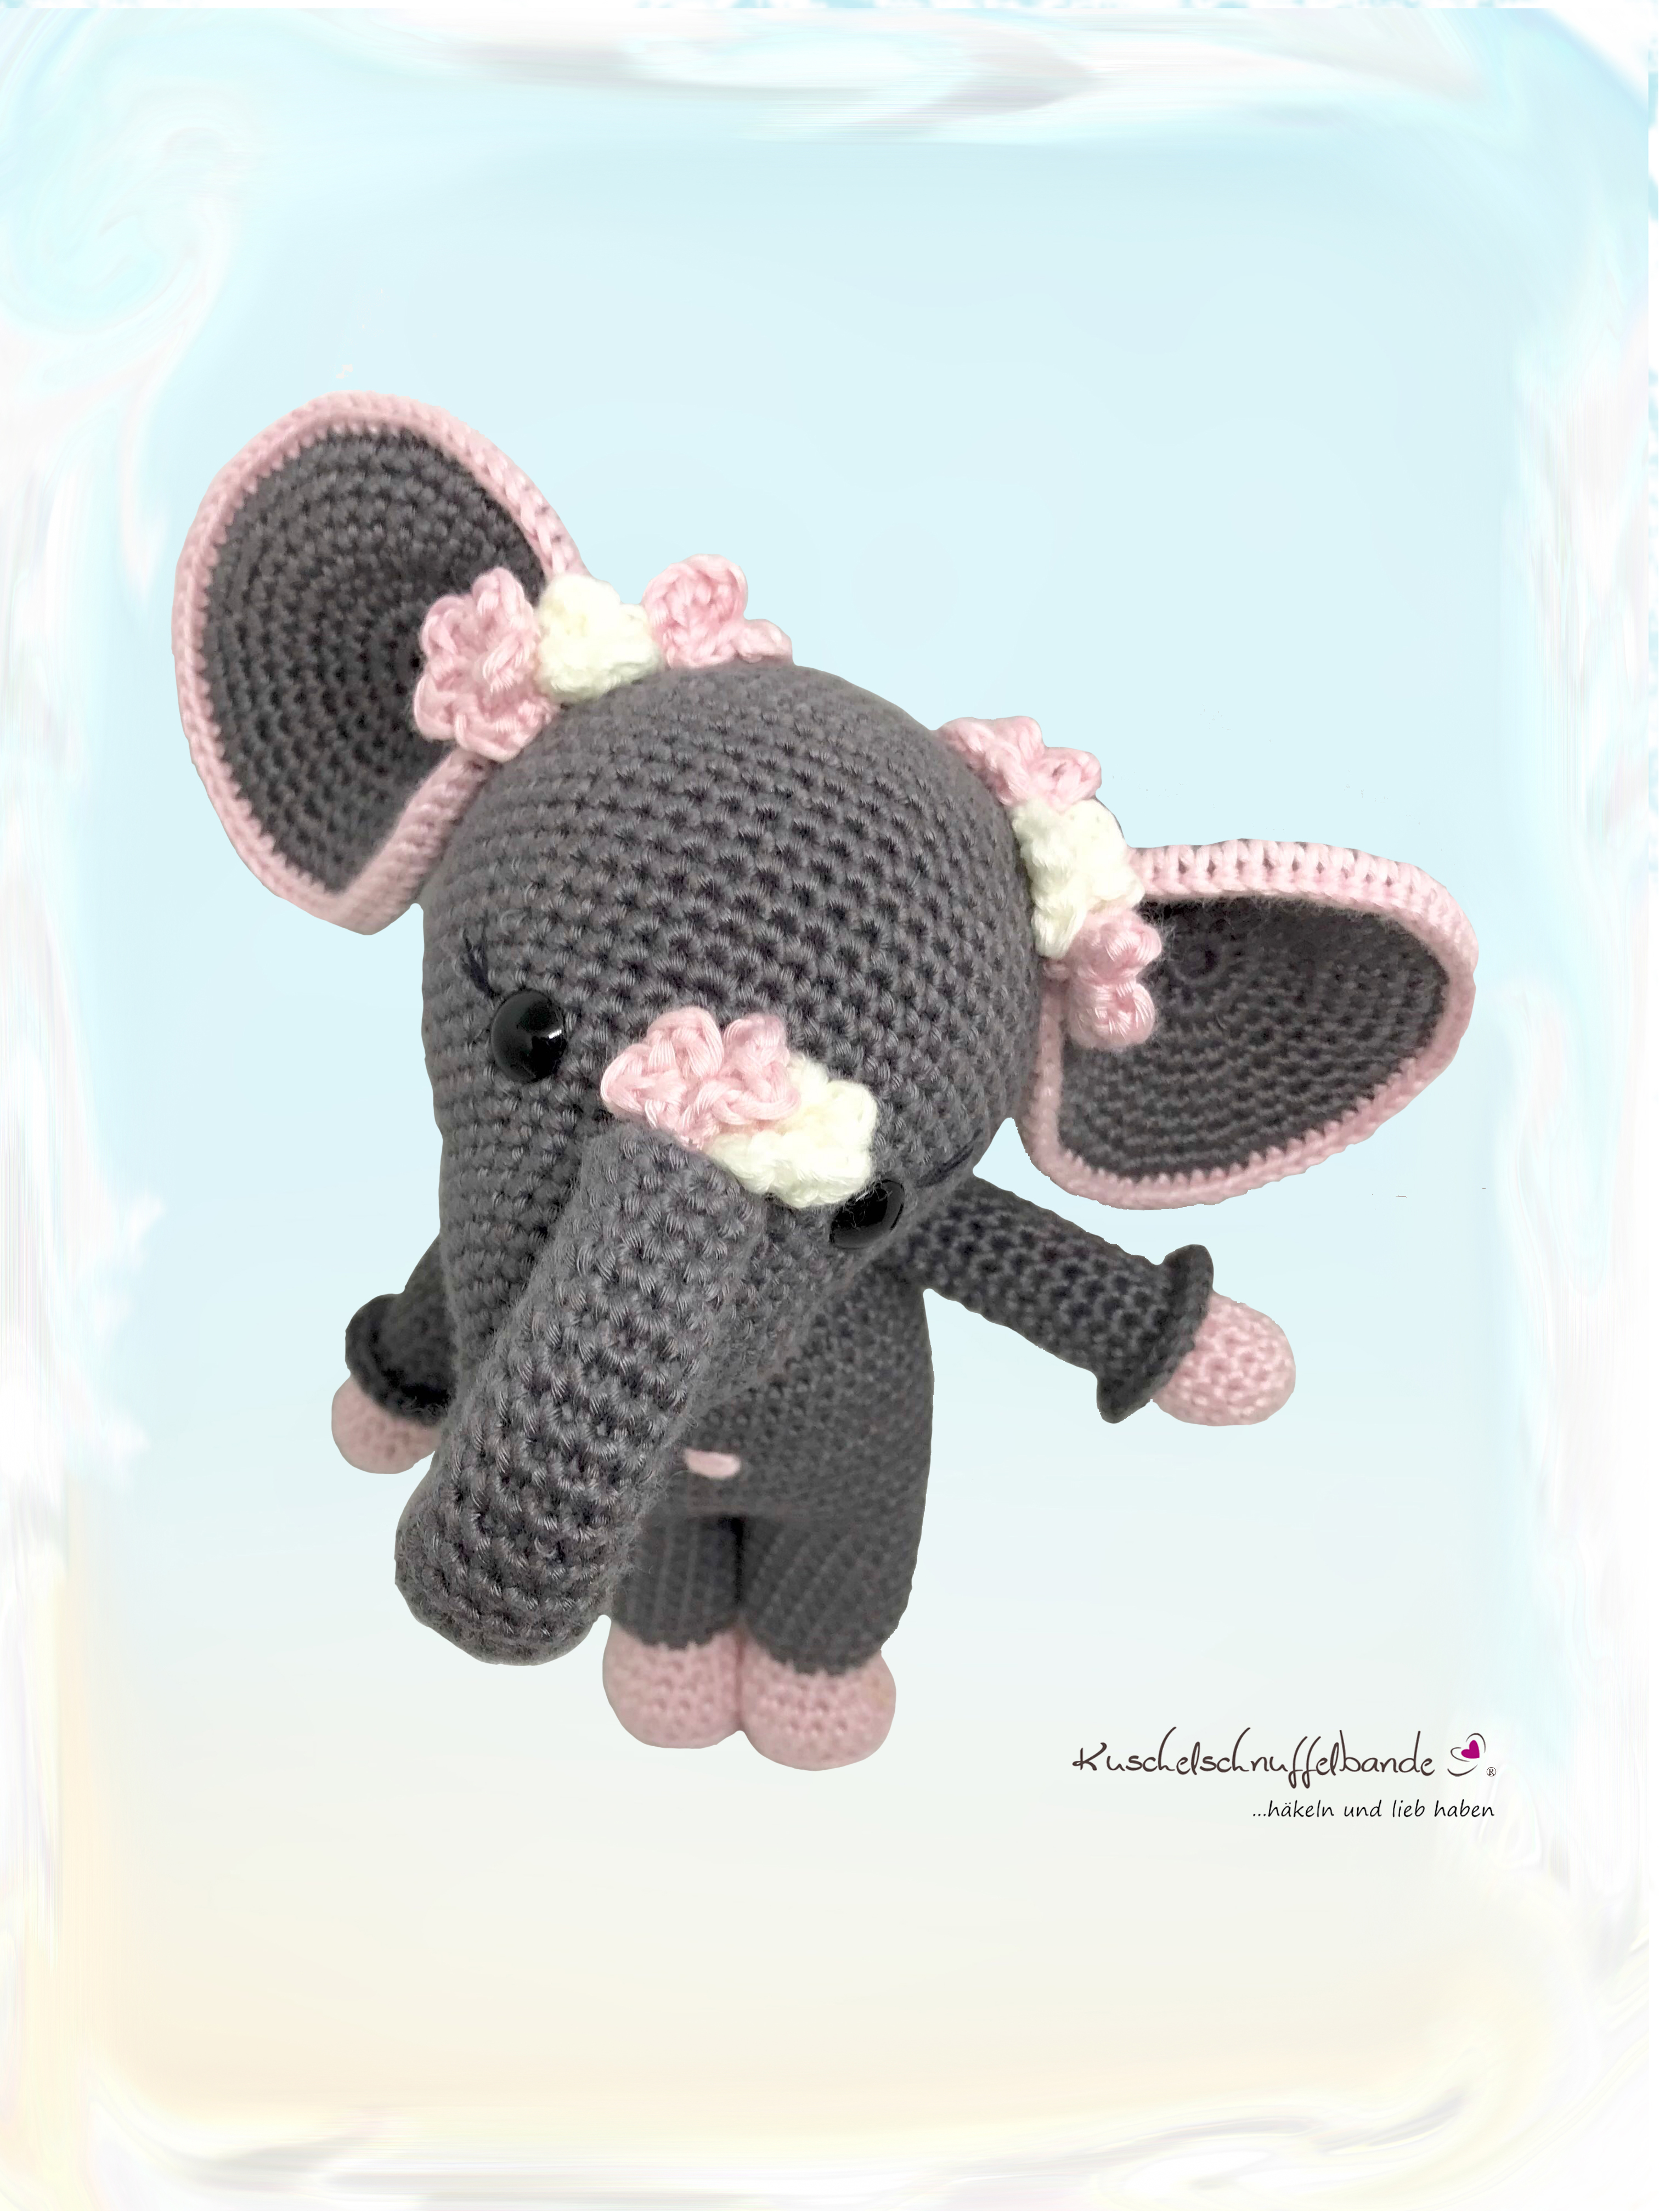 Häkelanleitung Kuschelschnuffelbande Baby Elefant Elli Amigurumi